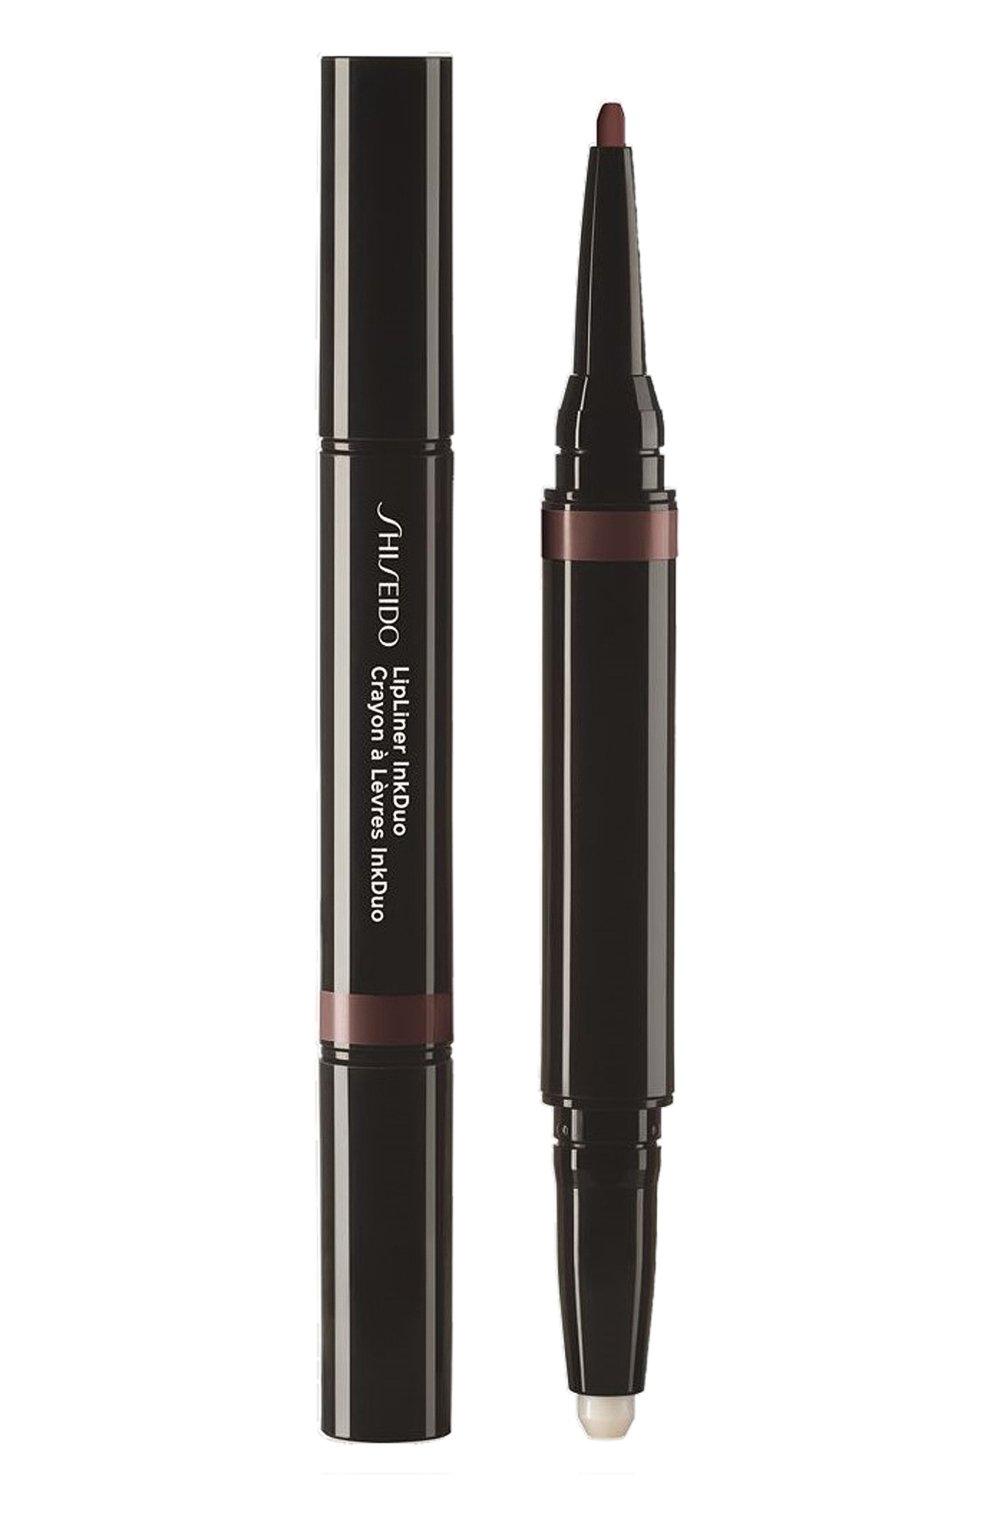 Дуэт для губ lipliner ink: праймер + карандаш, 12 espresso SHISEIDO бесцветного цвета, арт. 16426SH | Фото 1